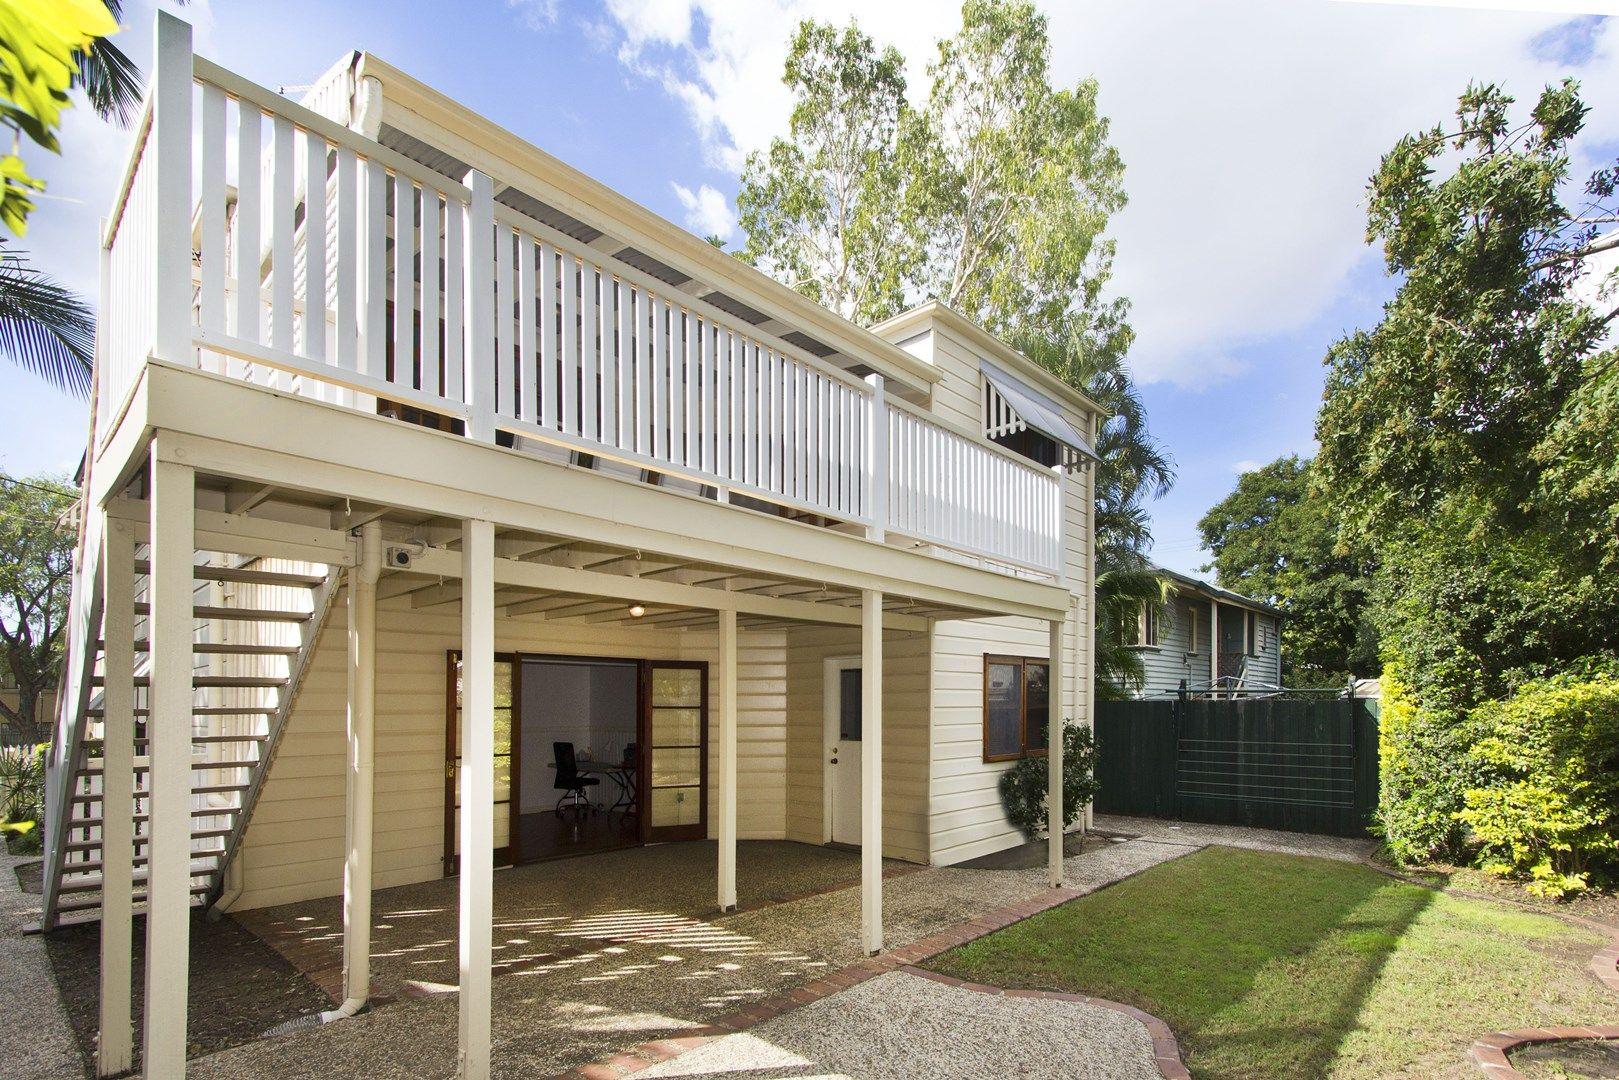 85 Borden Street, Sherwood QLD 4075, Image 0